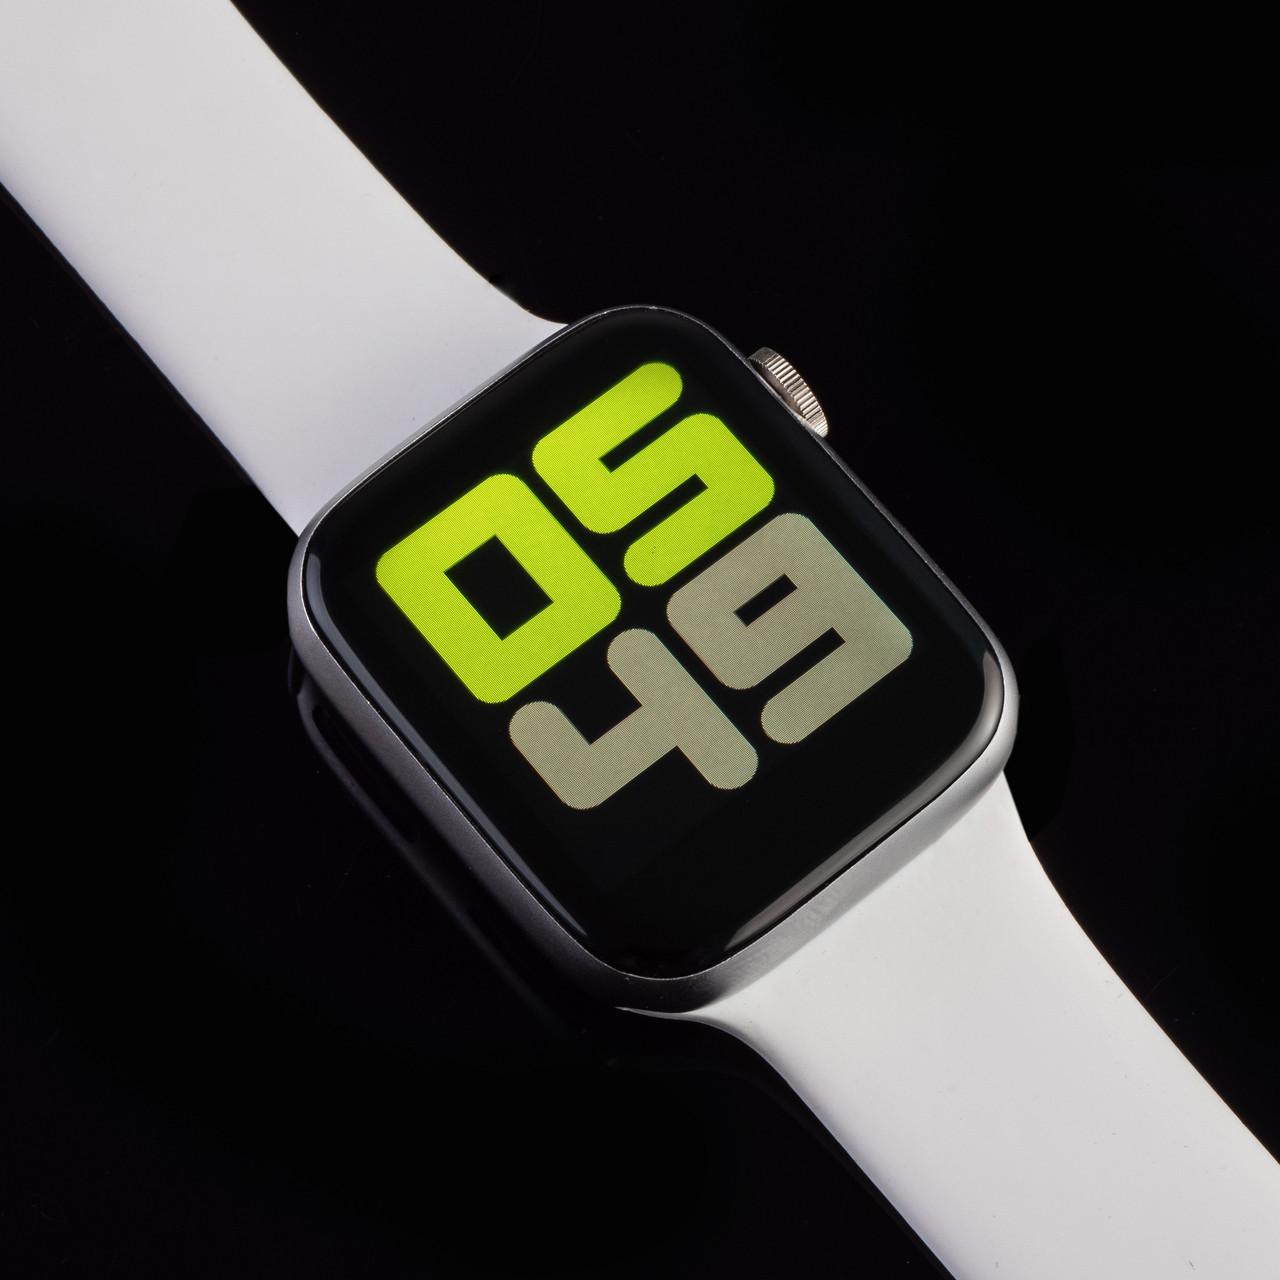 Смарт часы AirPlus Smart Watch T500 белый цвет. Диагональ 1.54, умные часы, фитнес браслет.